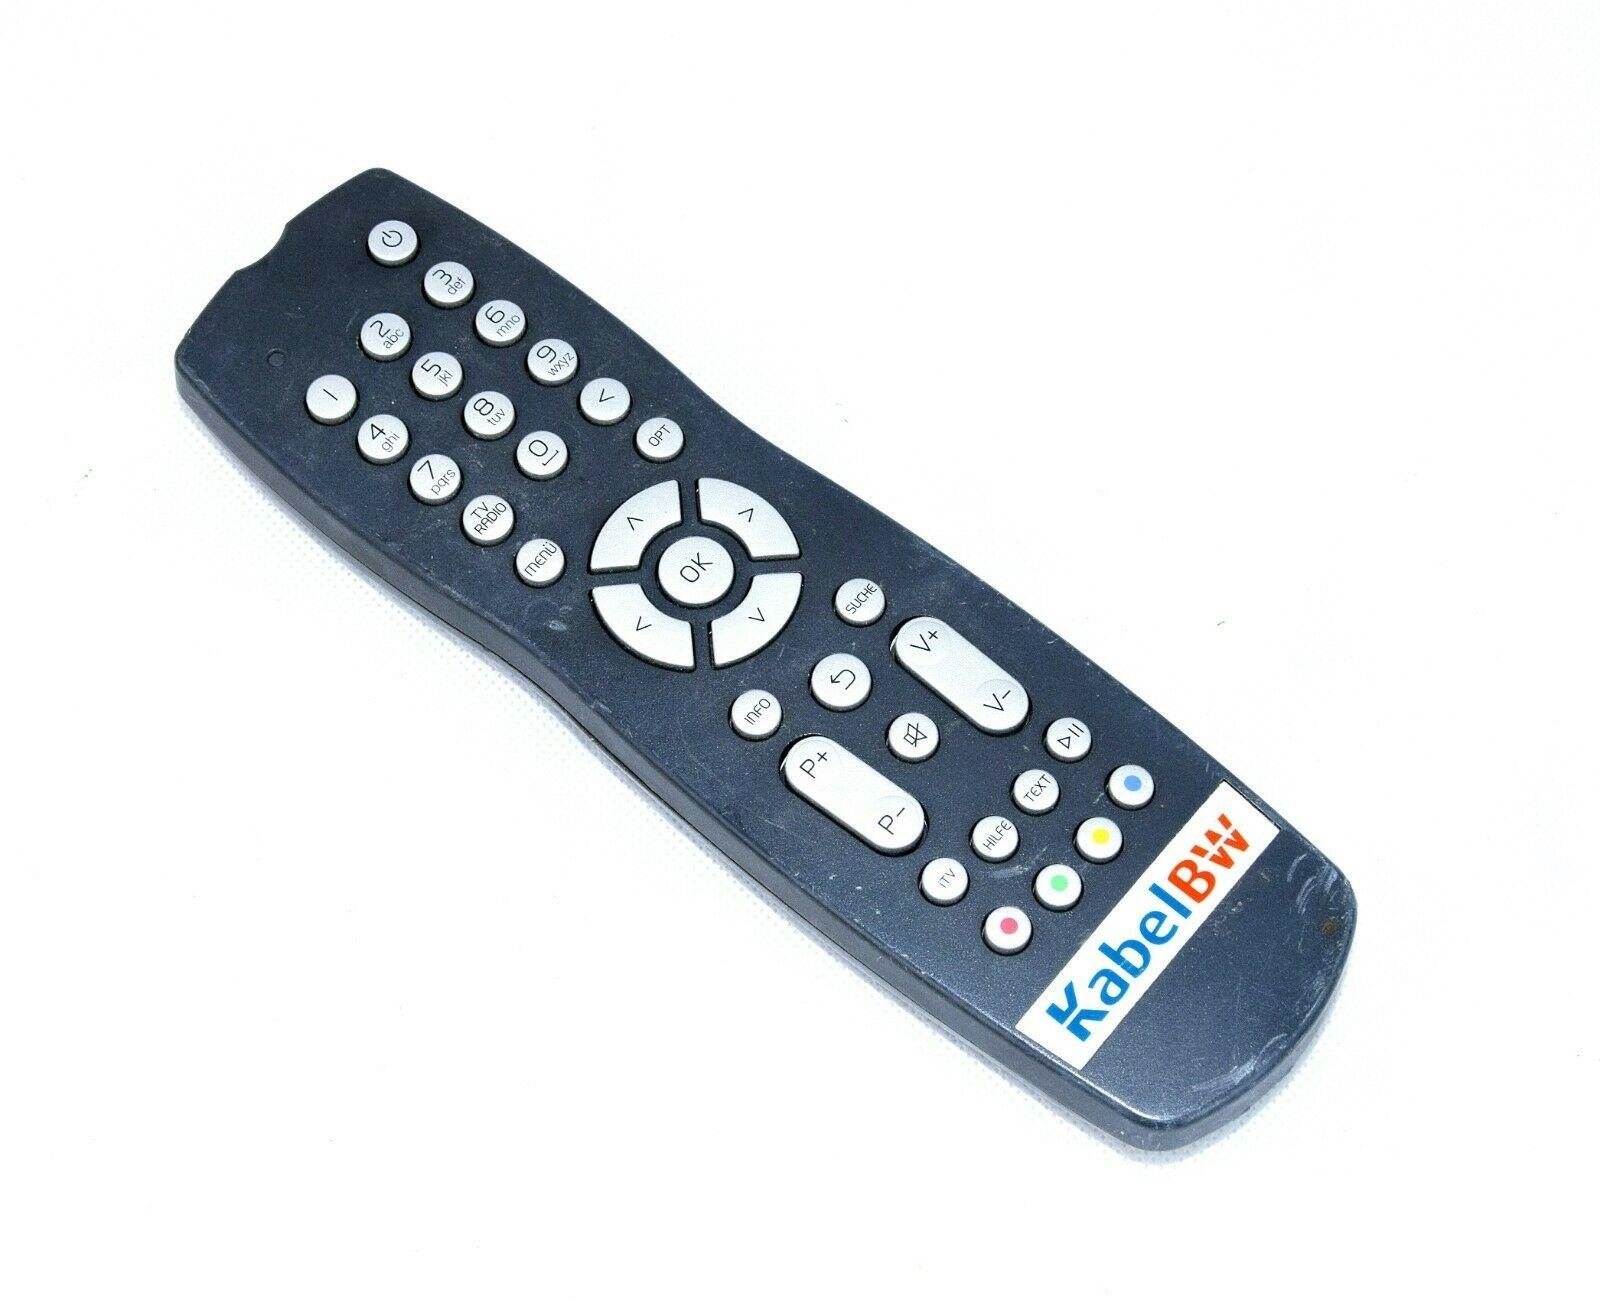 Kabel BW Kabel BW Original Fernbedienung PRC 20 Remote Control